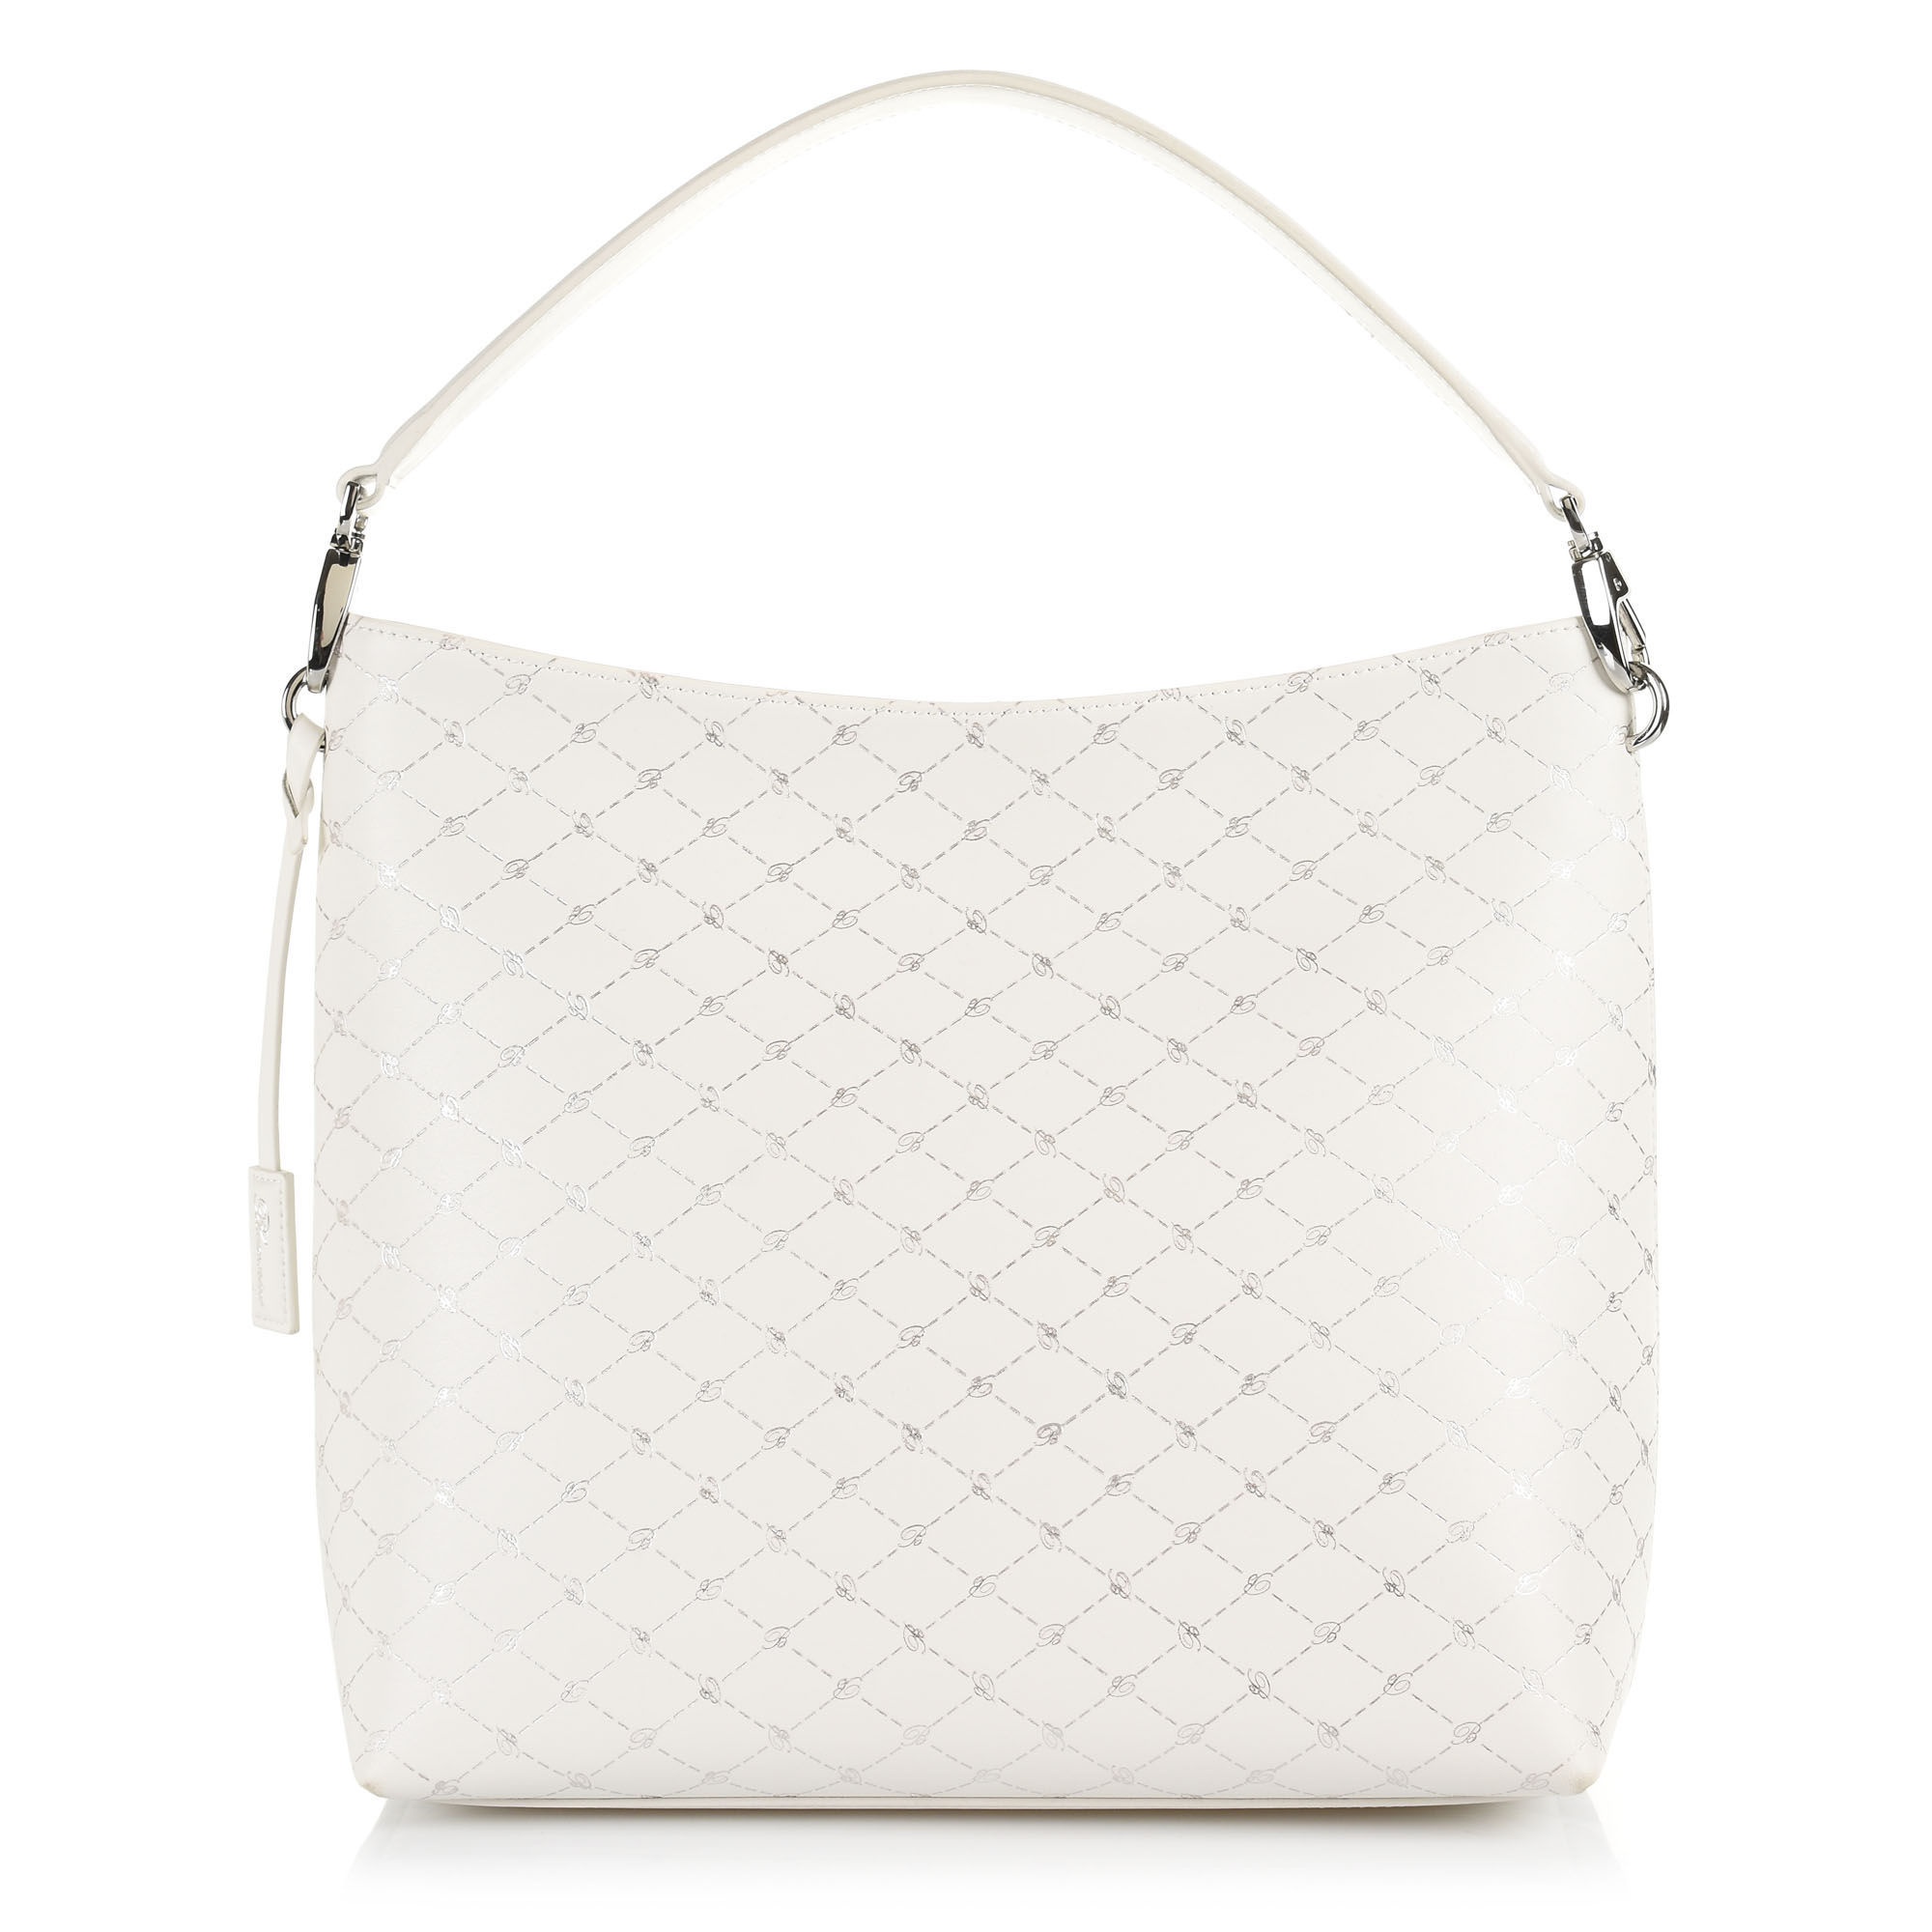 fd25eeda02 -20% Brand Bags Δερμάτινη Τσάντα Ώμου Blumarine B Obsession B30.010